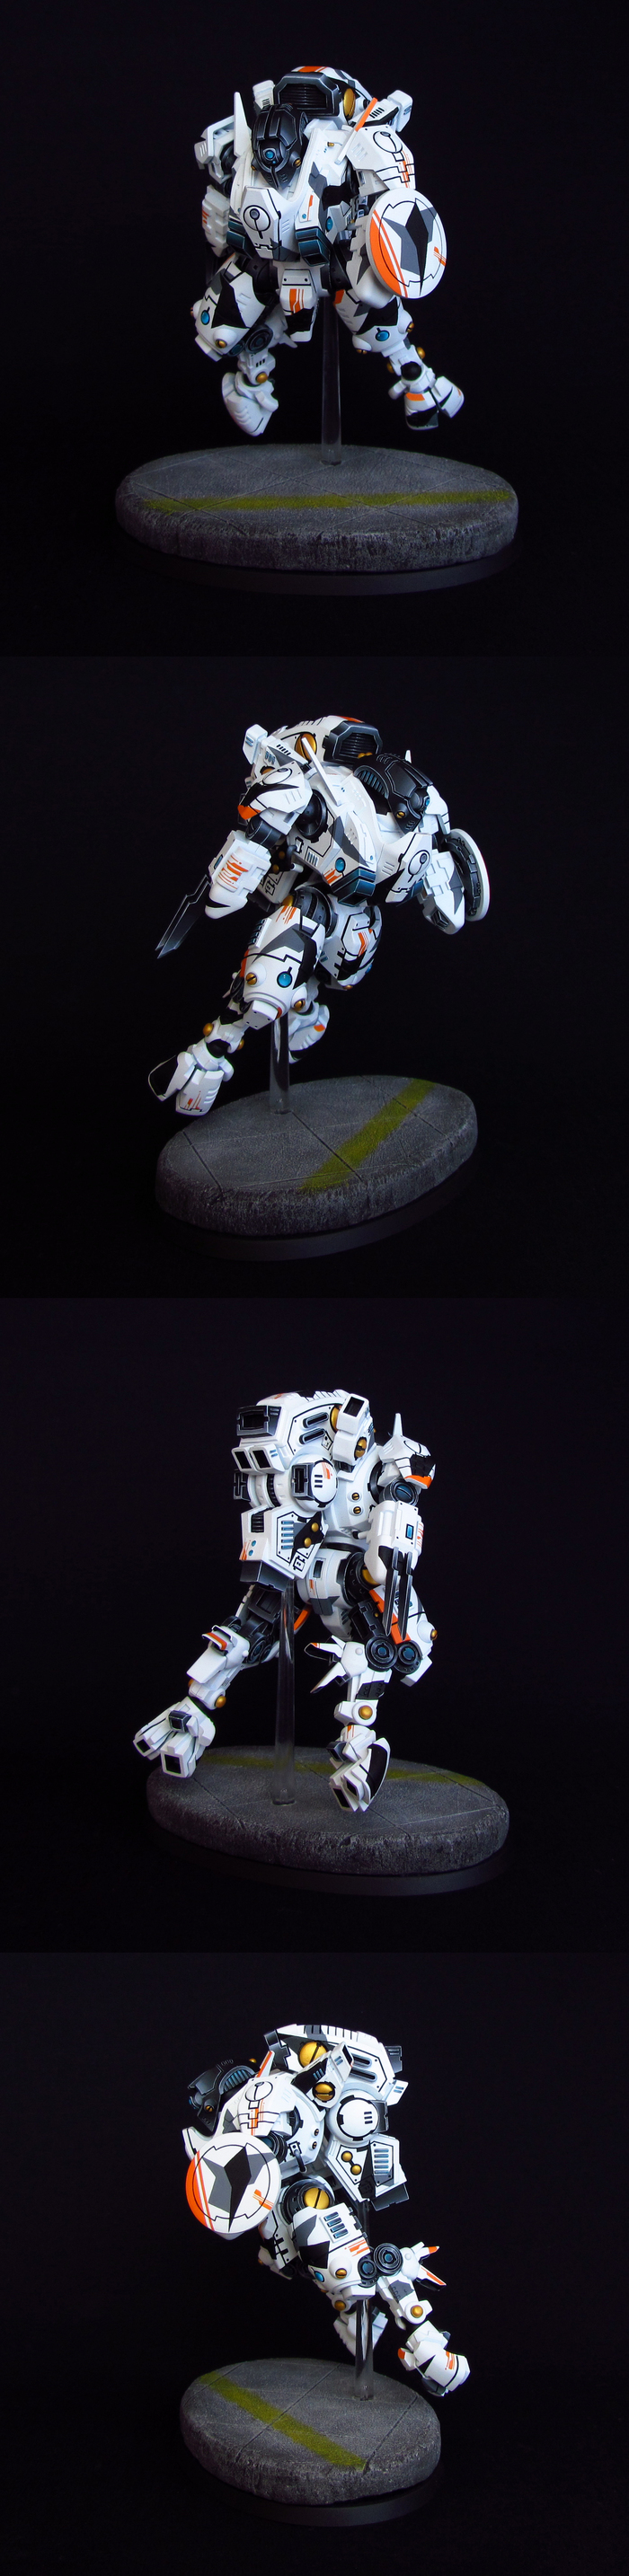 XV95 Ghostkeel Warhammer 40k, WH Miniatures, Tau, Miniatures, Миниатюра, Роспись, Длиннопост